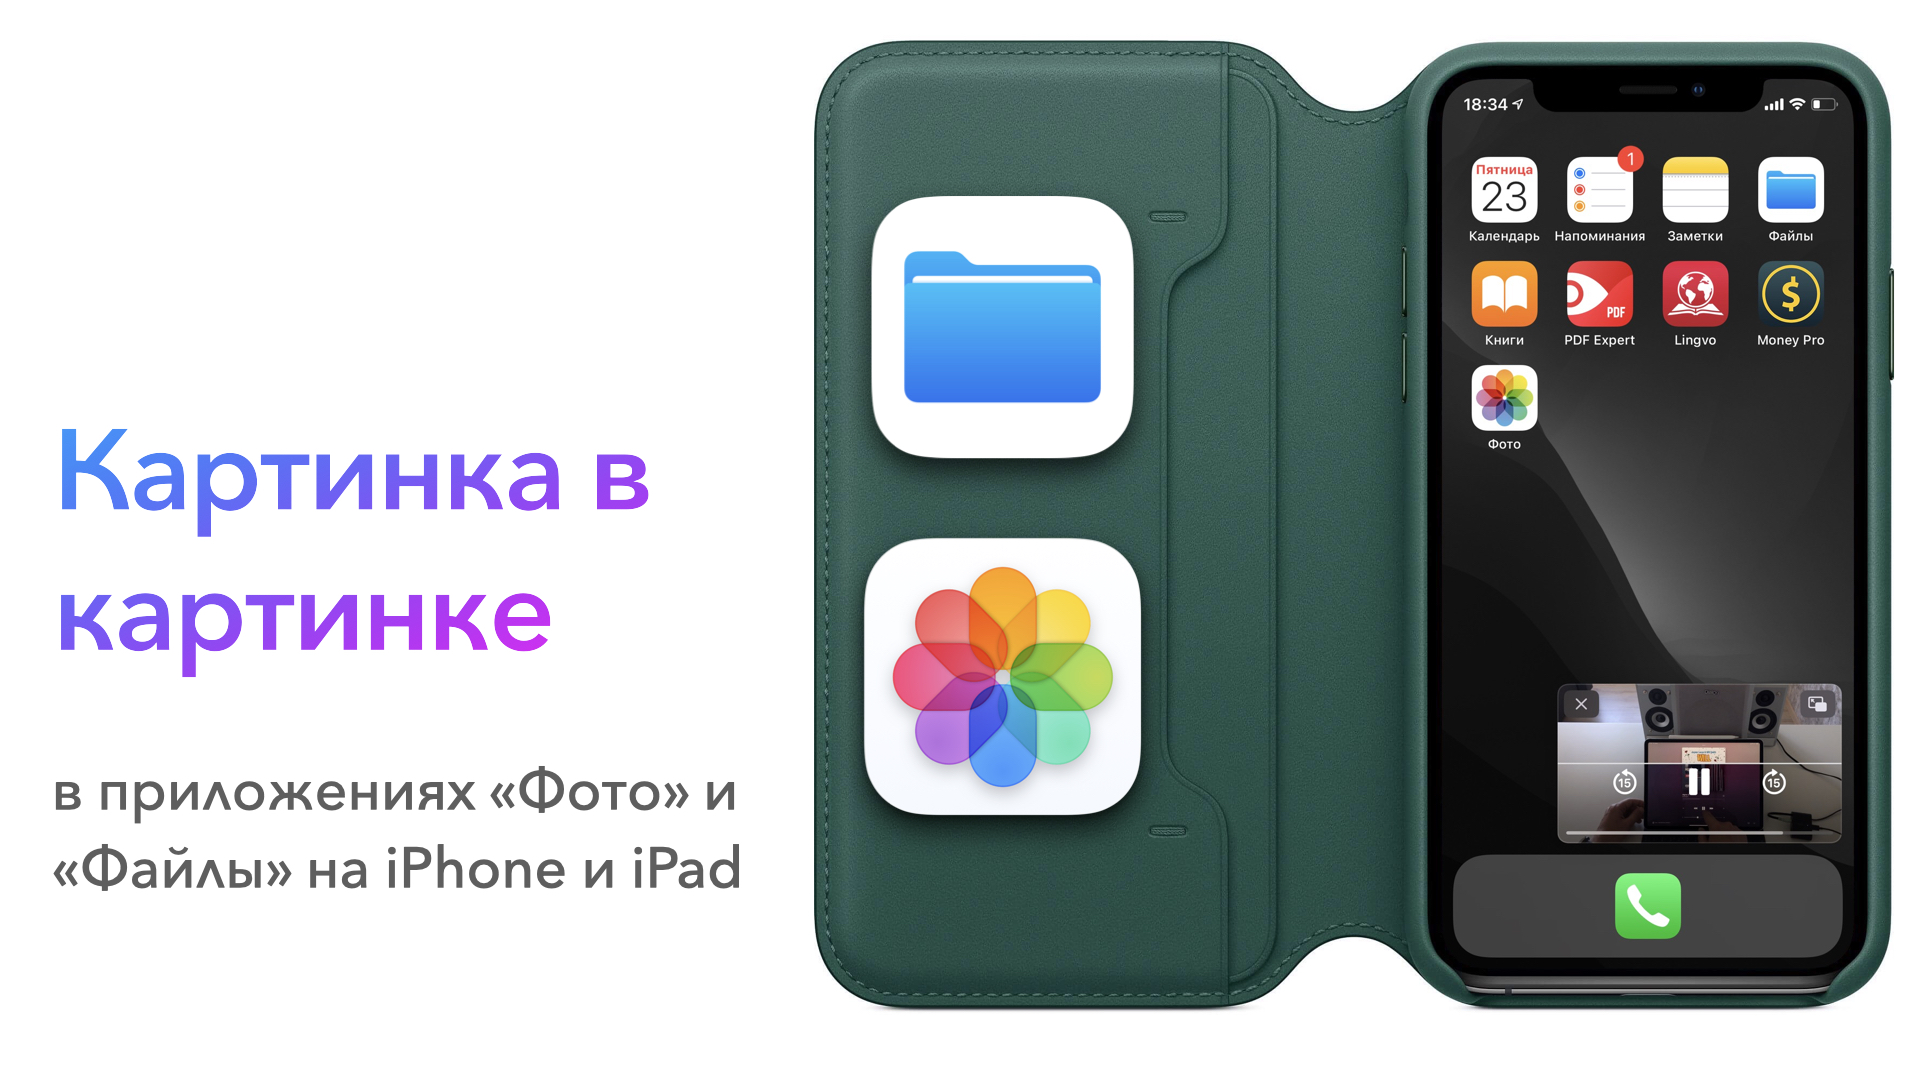 Картинка в картинке в приложениях «Фото» и «Файлы» на iPhone и iPad